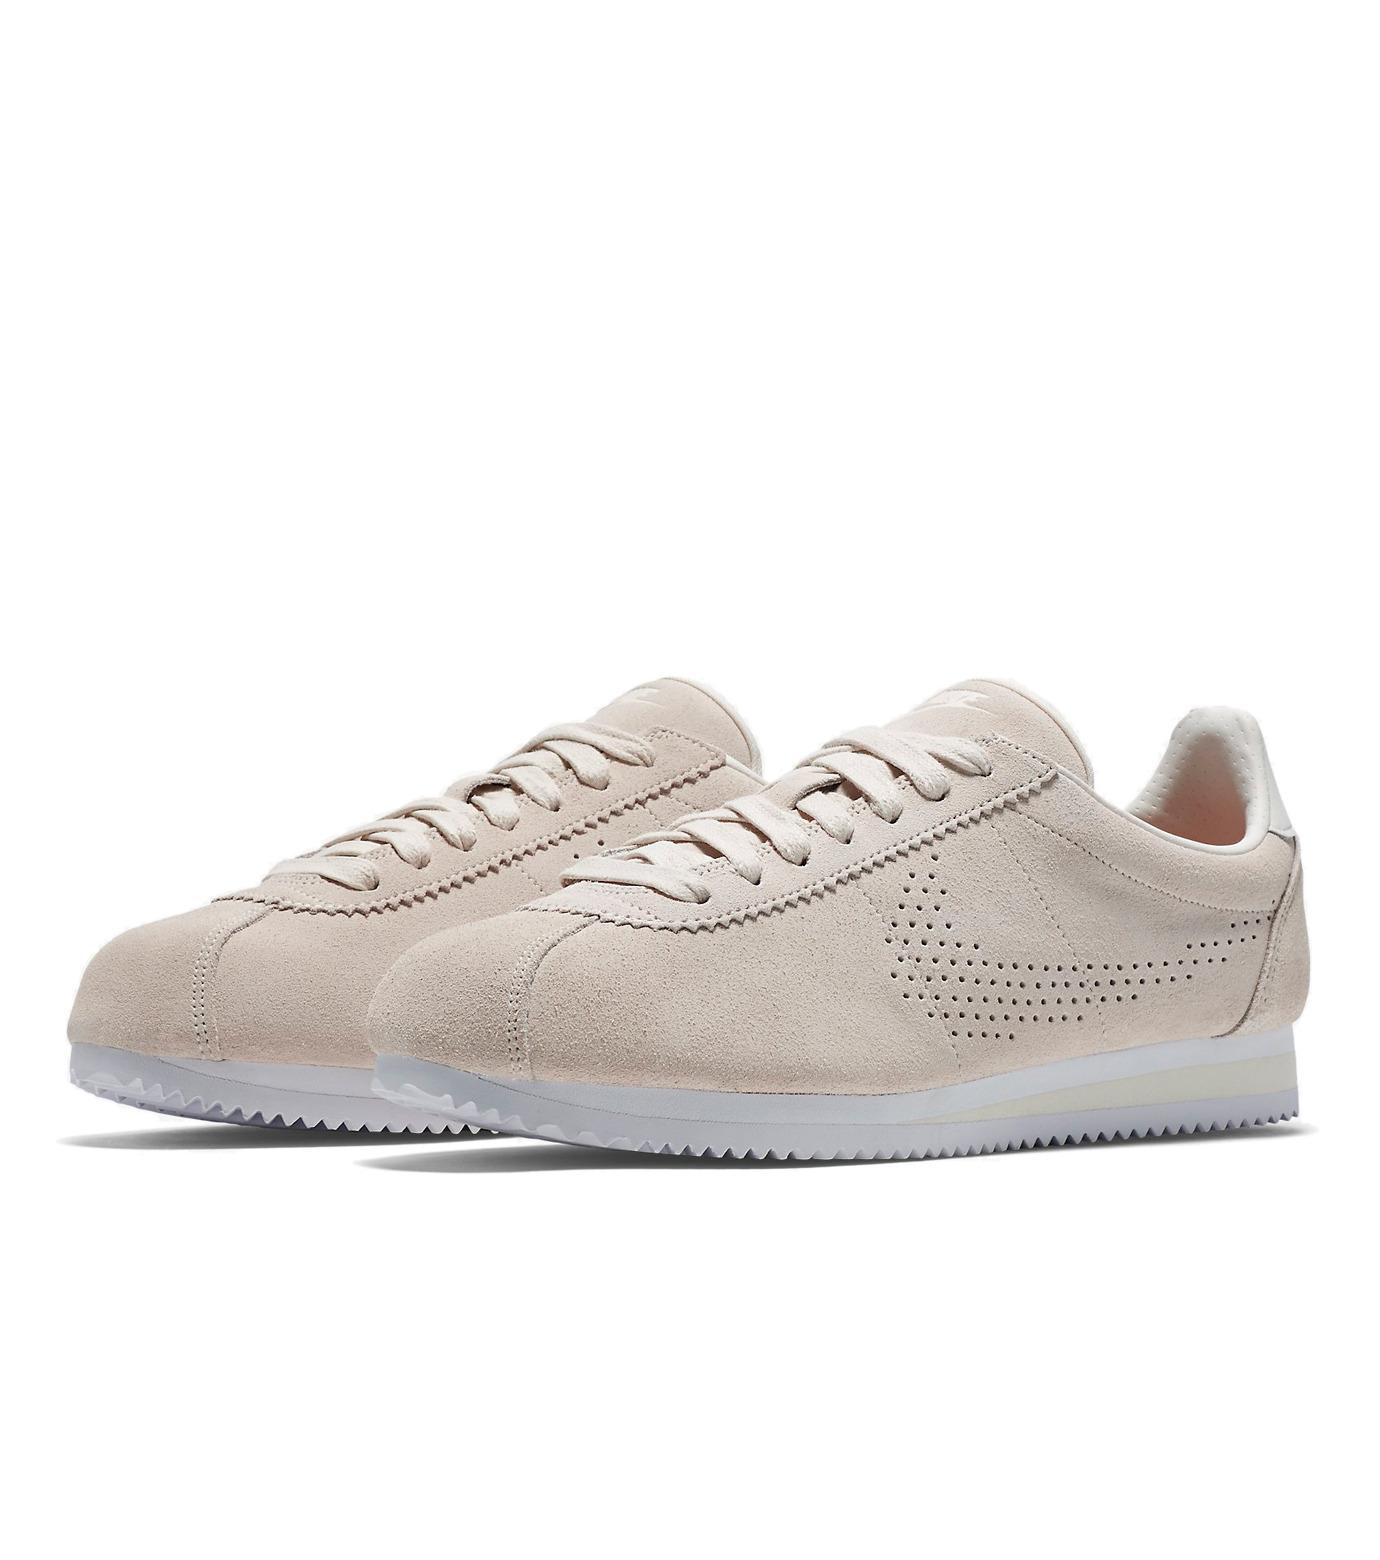 NIKE(ナイキ)のCLASSIC CORTEZ LX-BEIGE(シューズ/shoes)-823914-055-52 拡大詳細画像3